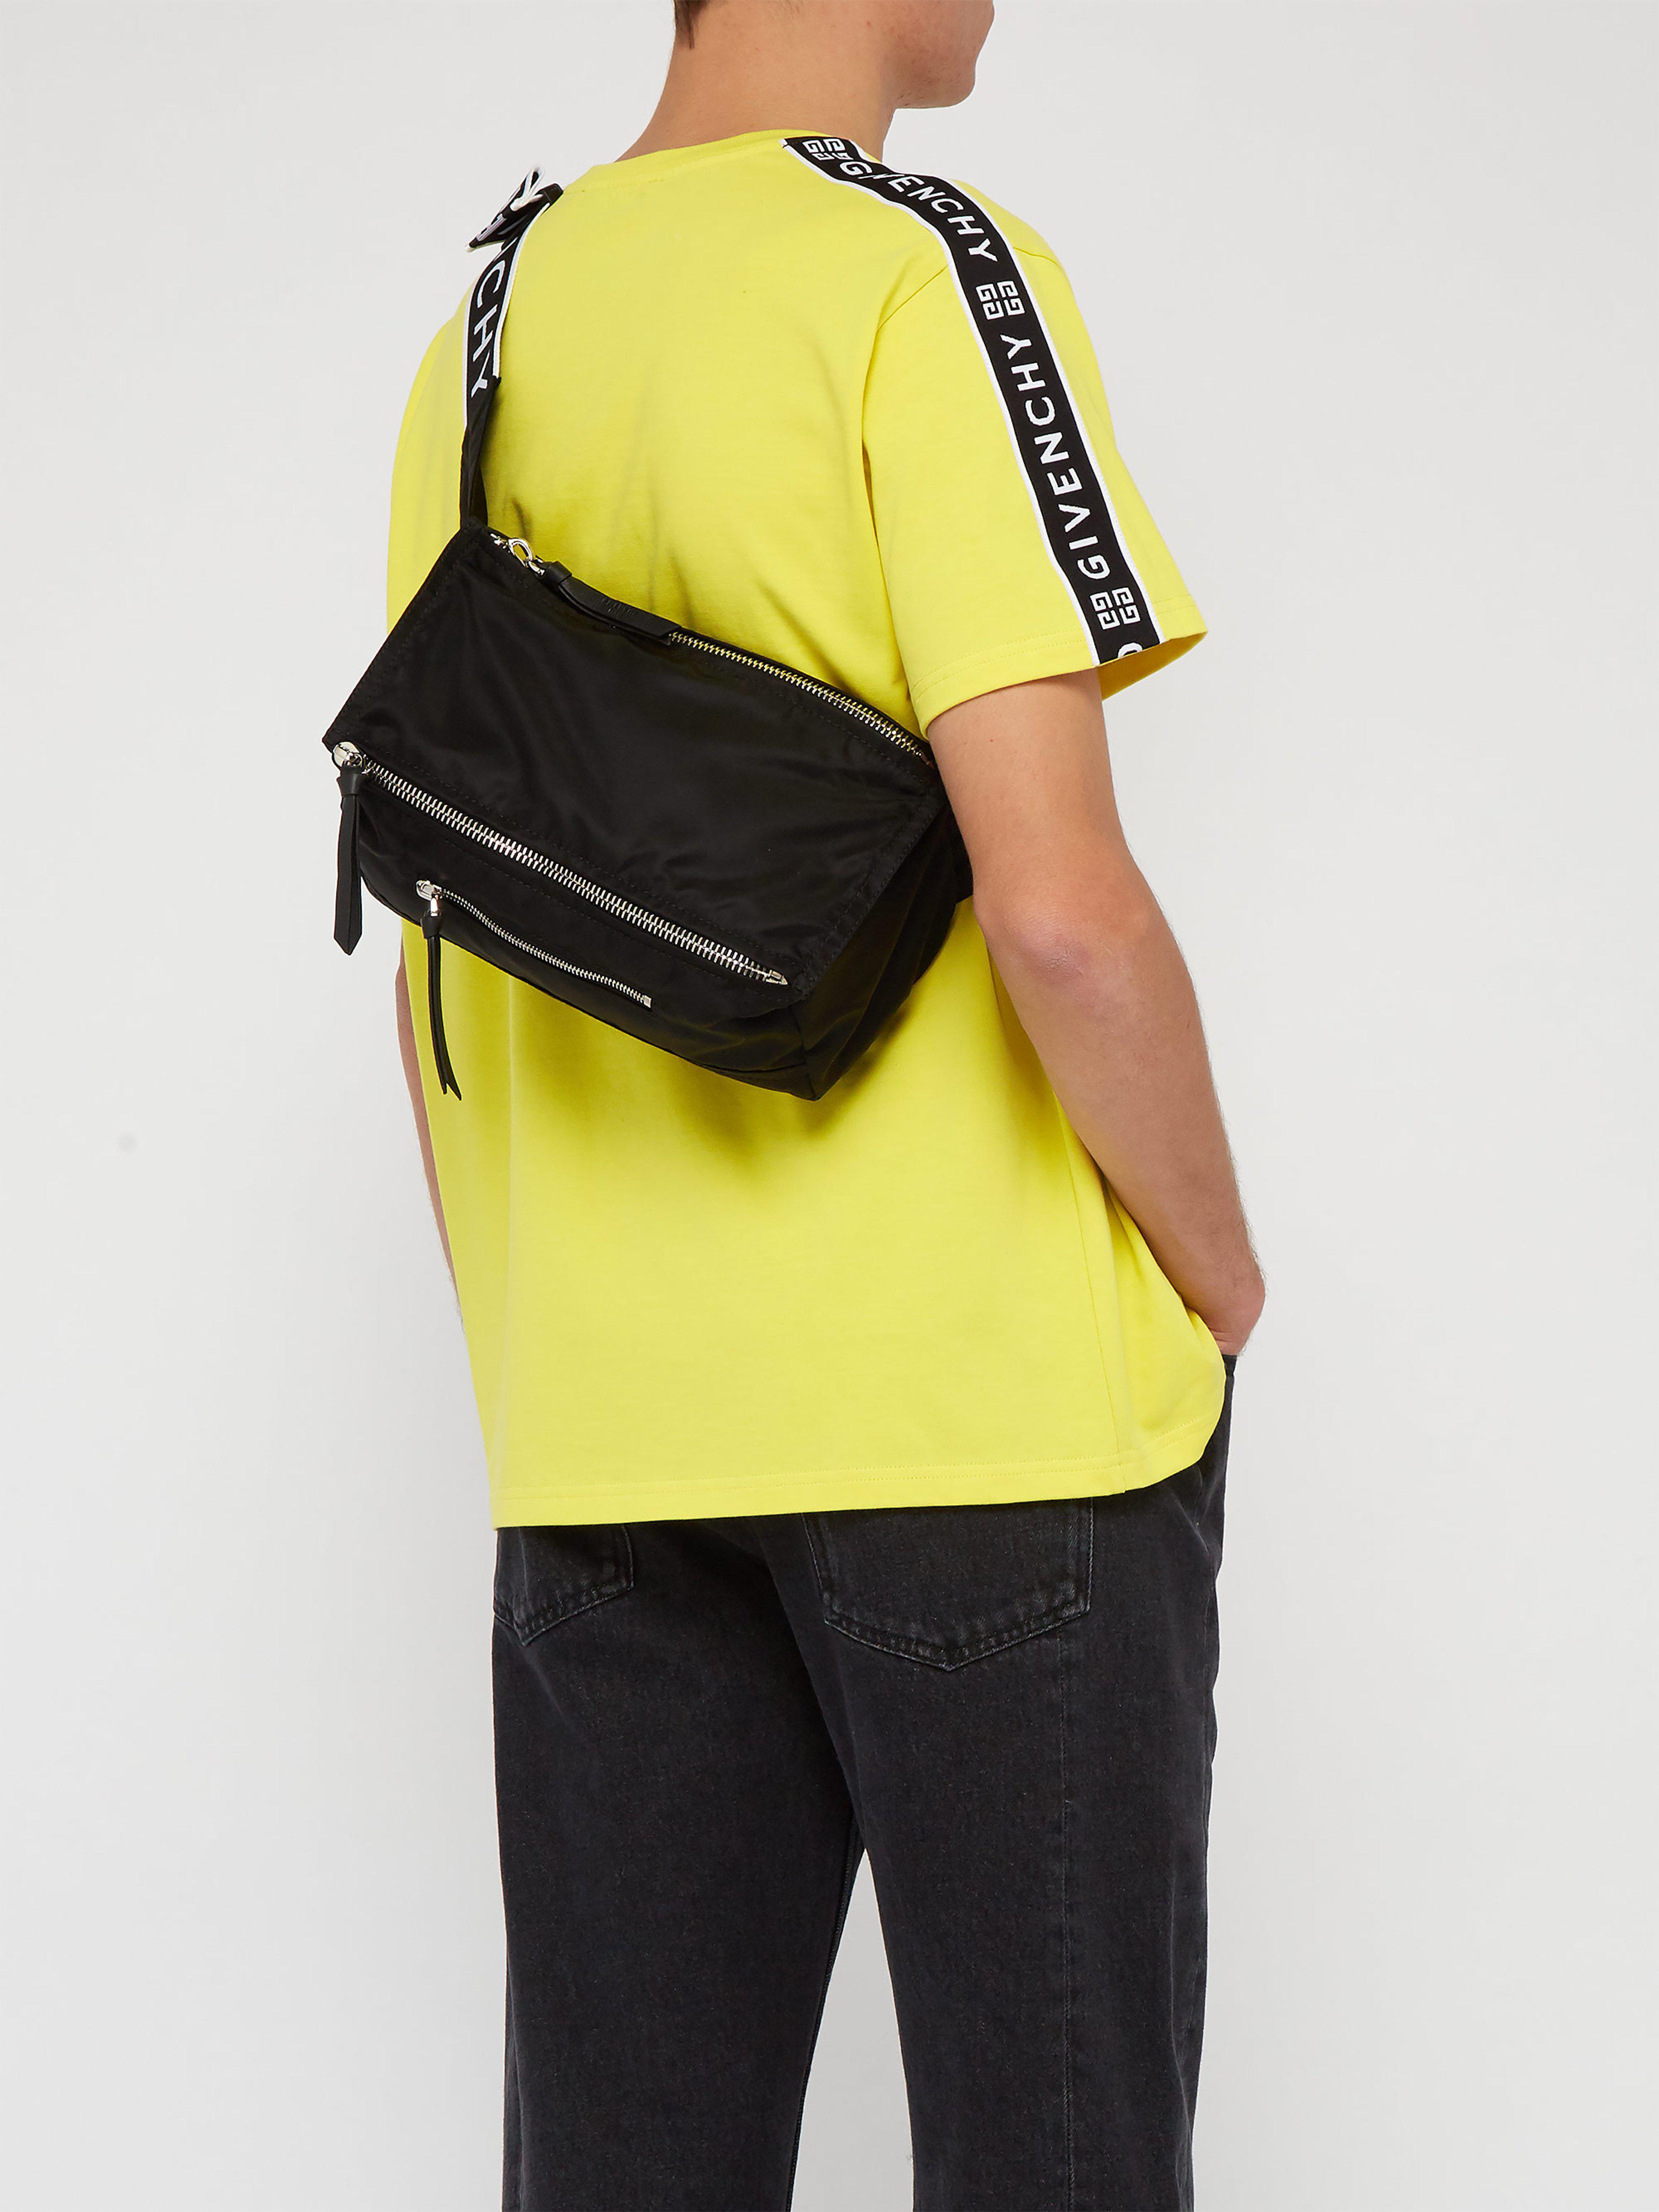 Givenchy - Black Pandora Shell Cross Body Bag for Men - Lyst. View  fullscreen 9dccc8e889